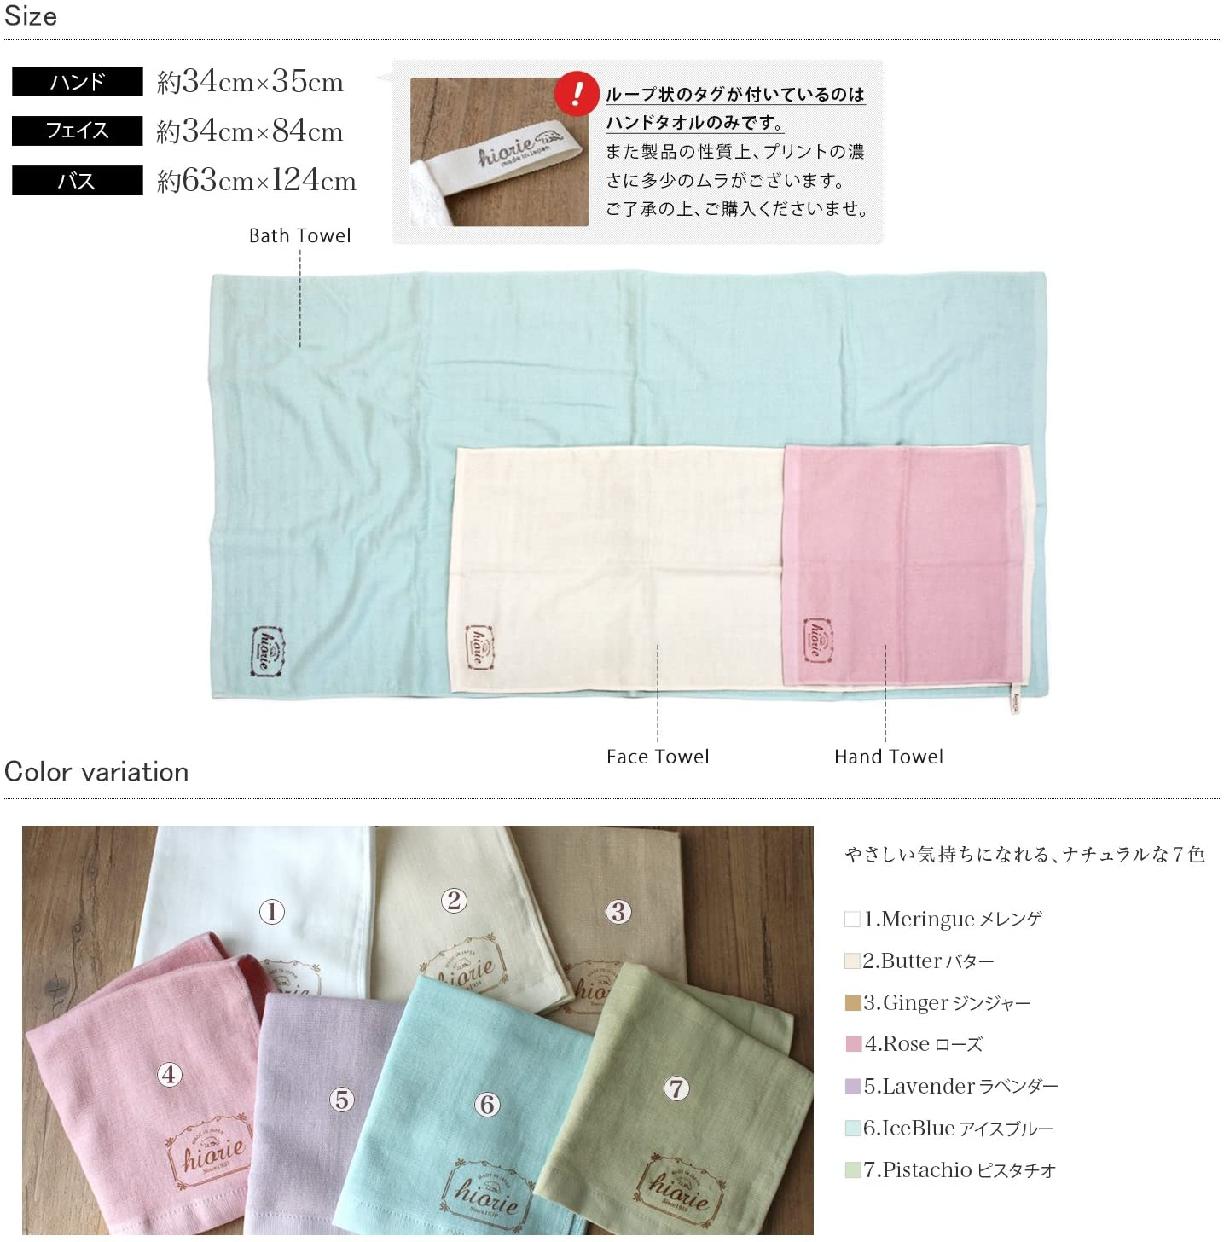 hiorie(ヒオリエ) ナチュラル ガーゼ バスタオルの商品画像2